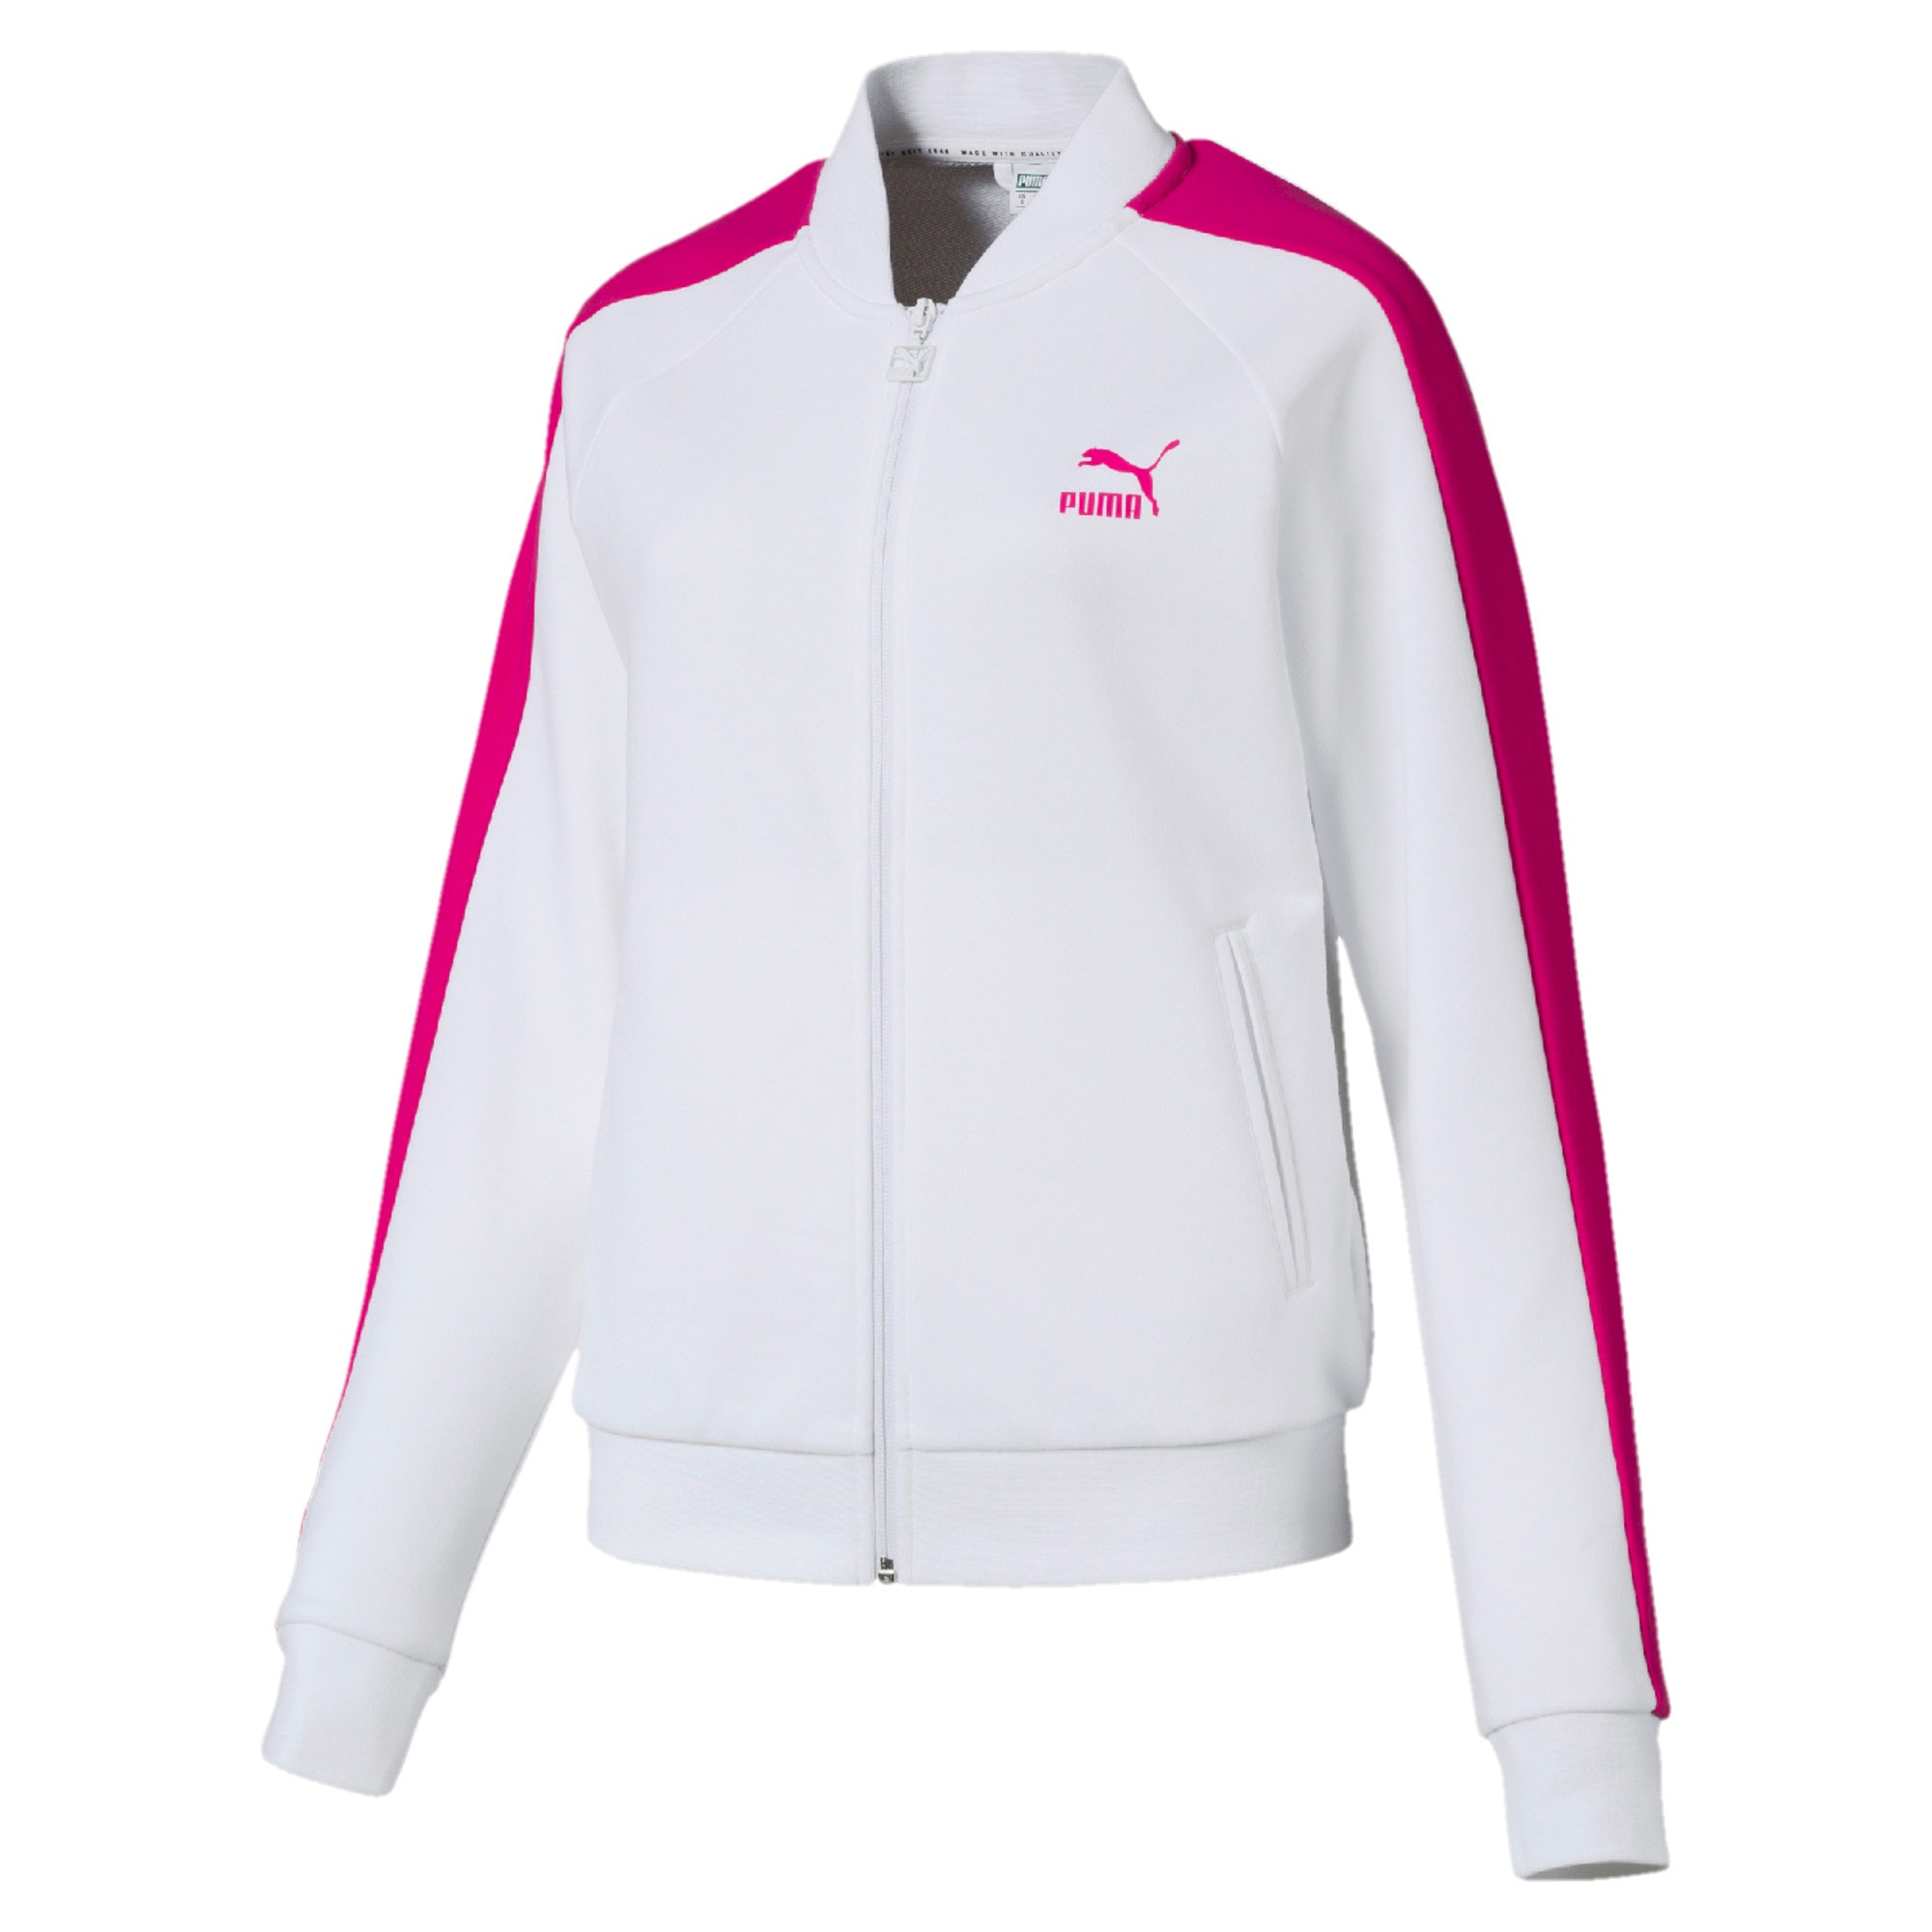 Thumbnail 1 of Classics Women's T7 Track Jacket, Puma White -1, medium